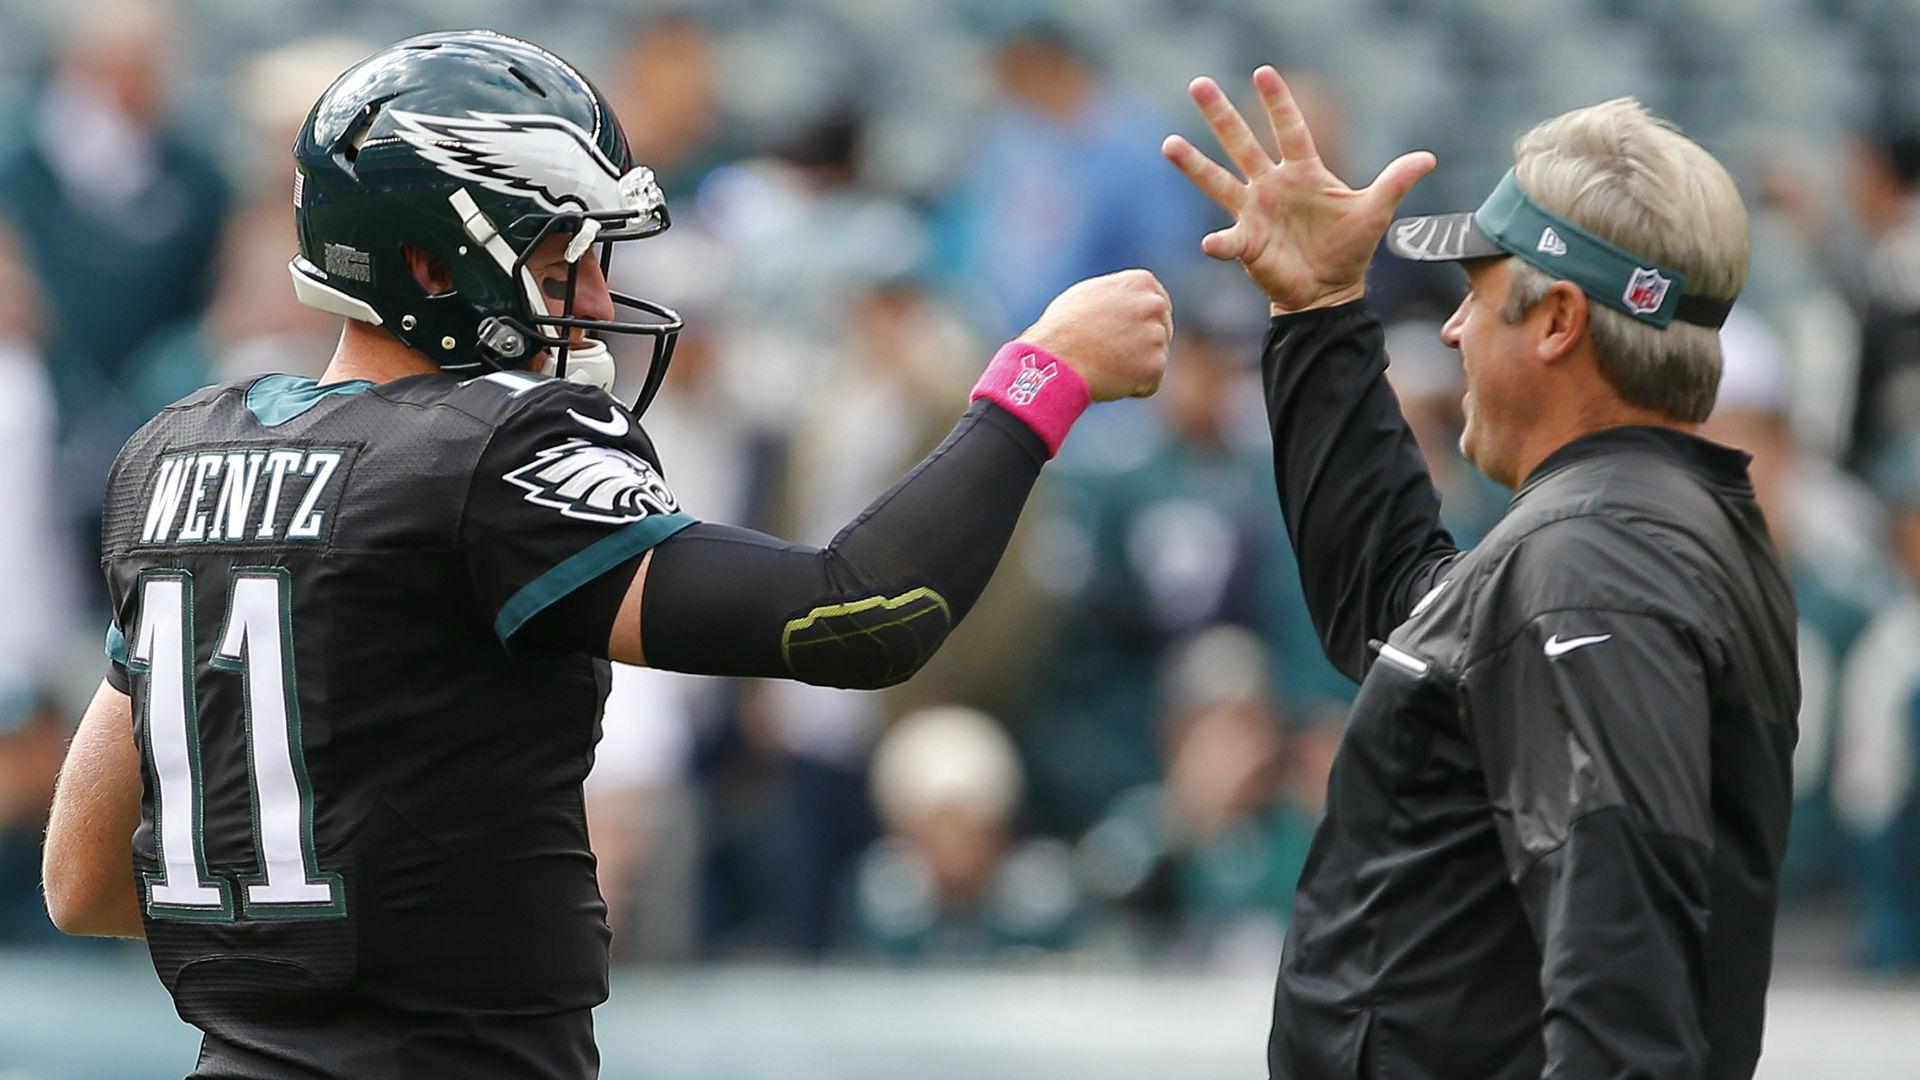 Eagles coach Doug Pederson says Carson Wentz 'is the quarterback going forward'